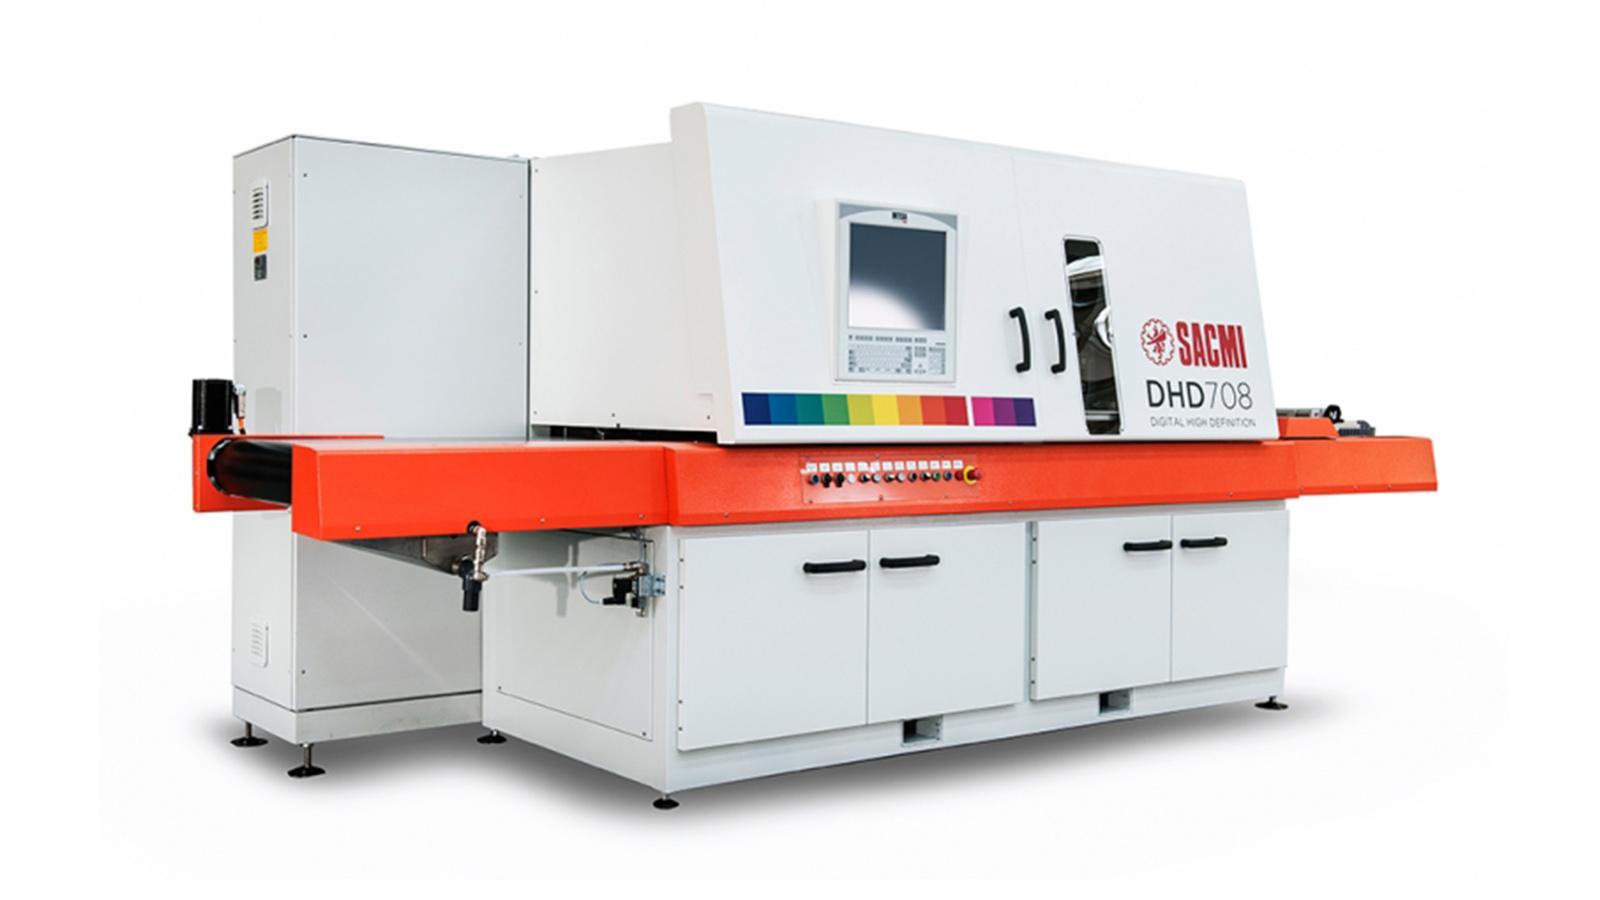 sacmi-macchine-digitali-2018-dhd-708